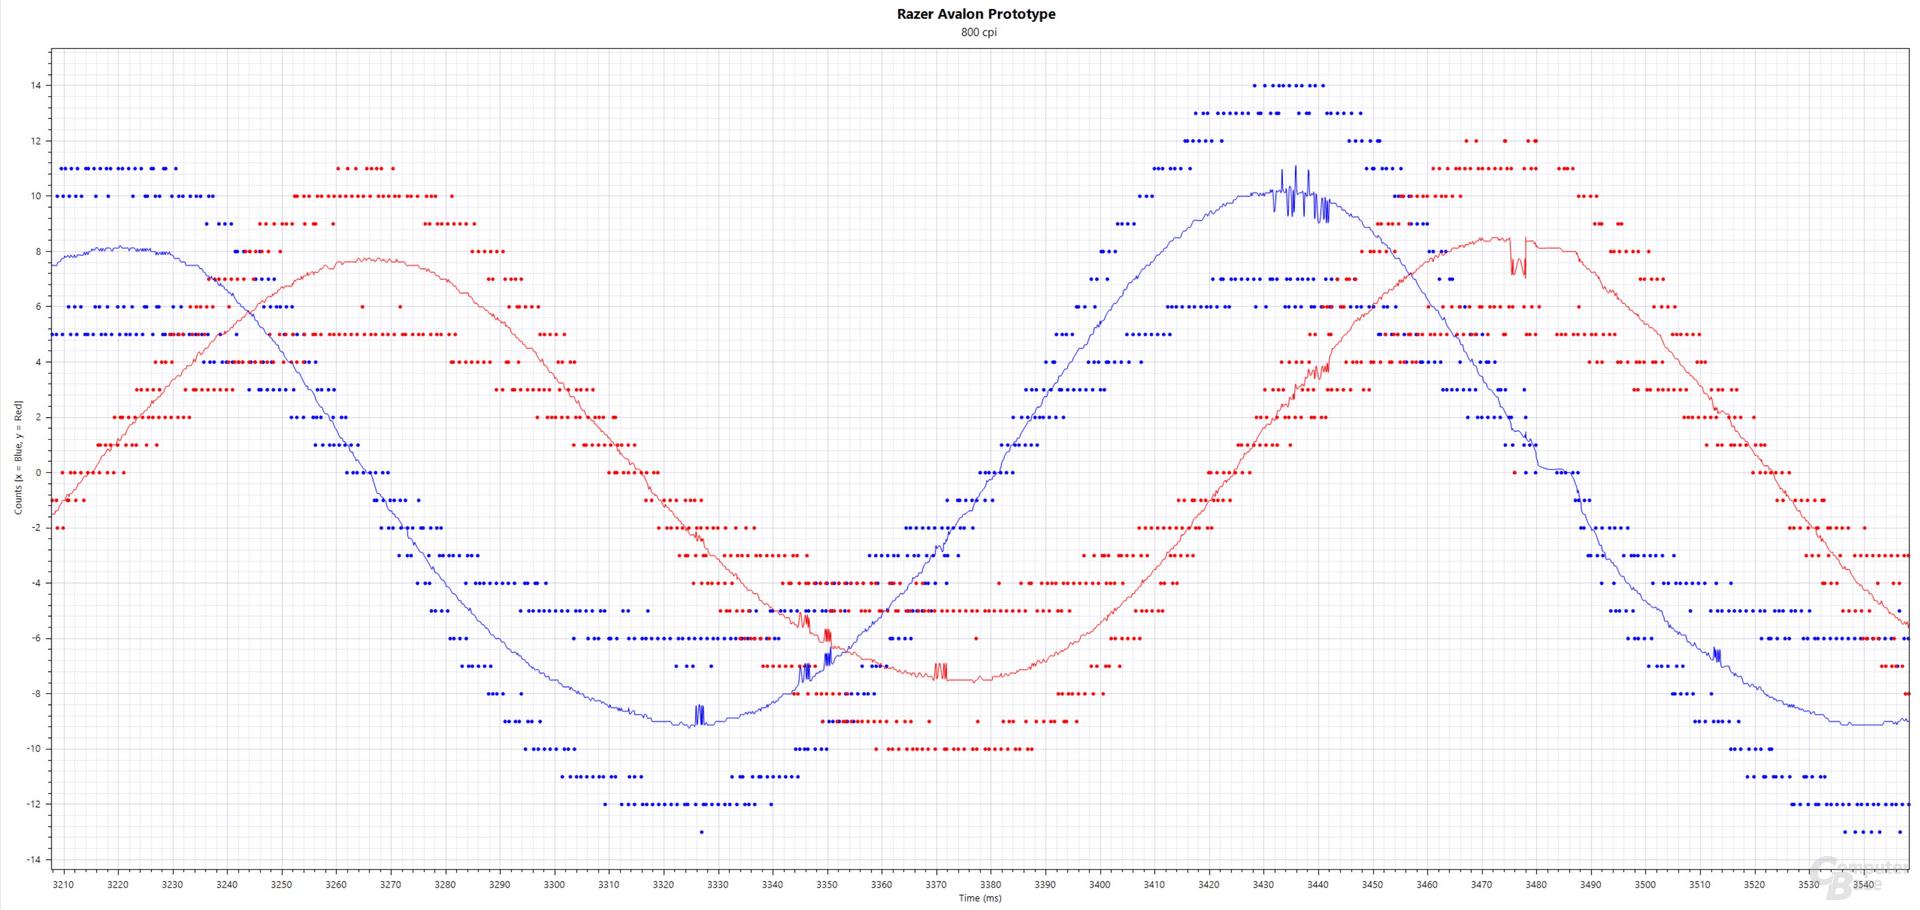 Blau: xCounts(ms), Rot: yCounts(ms); Razer Avalon Prototyp (PixArt PMW-3399, 800 cpi, 8.000 Hertz, Stoffmauspad), angebunden per USB-Hub